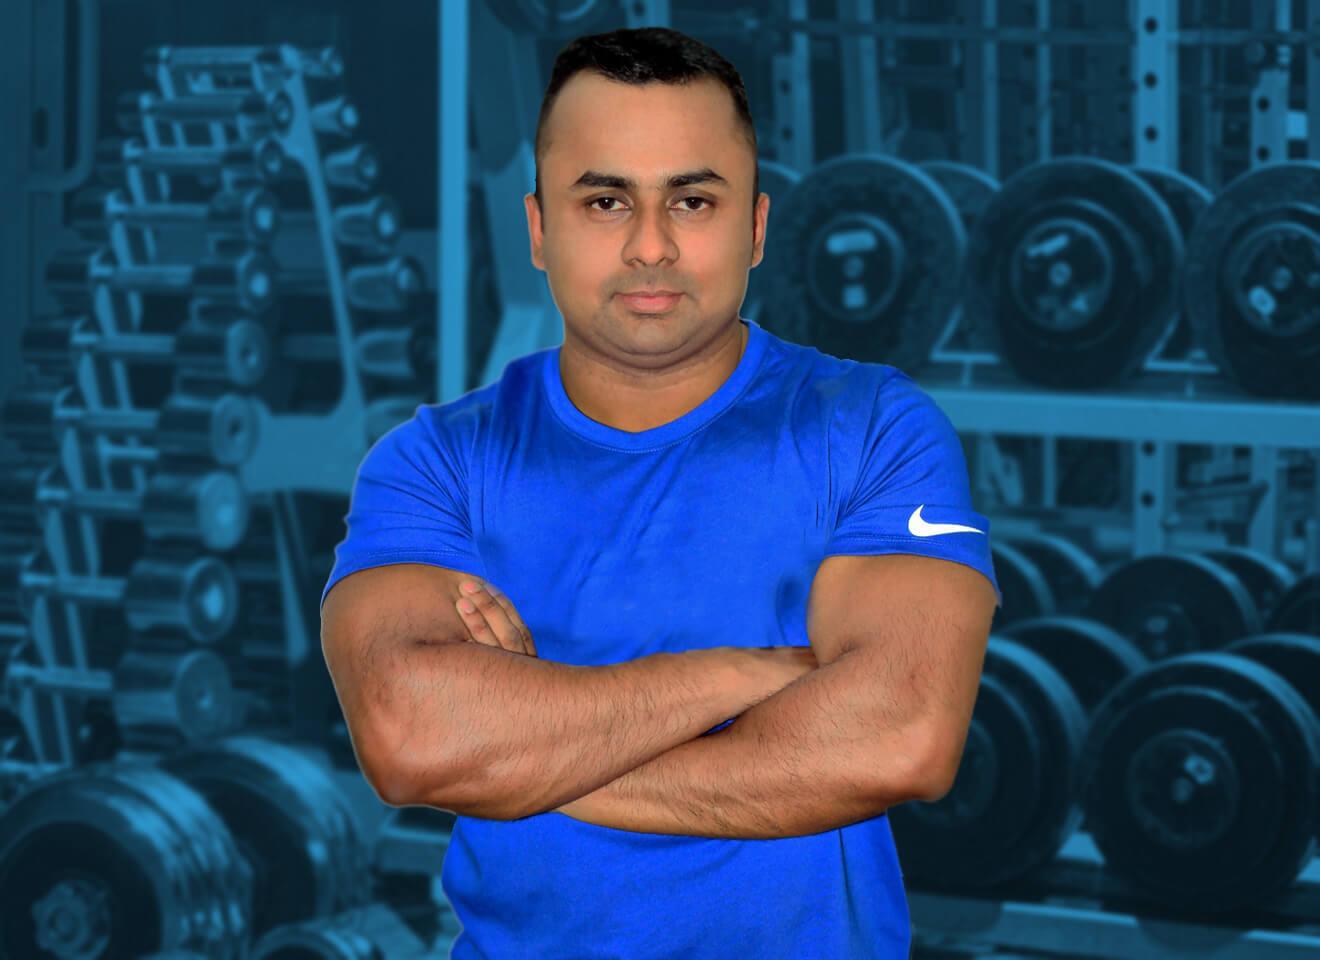 Arinjoy Mitra